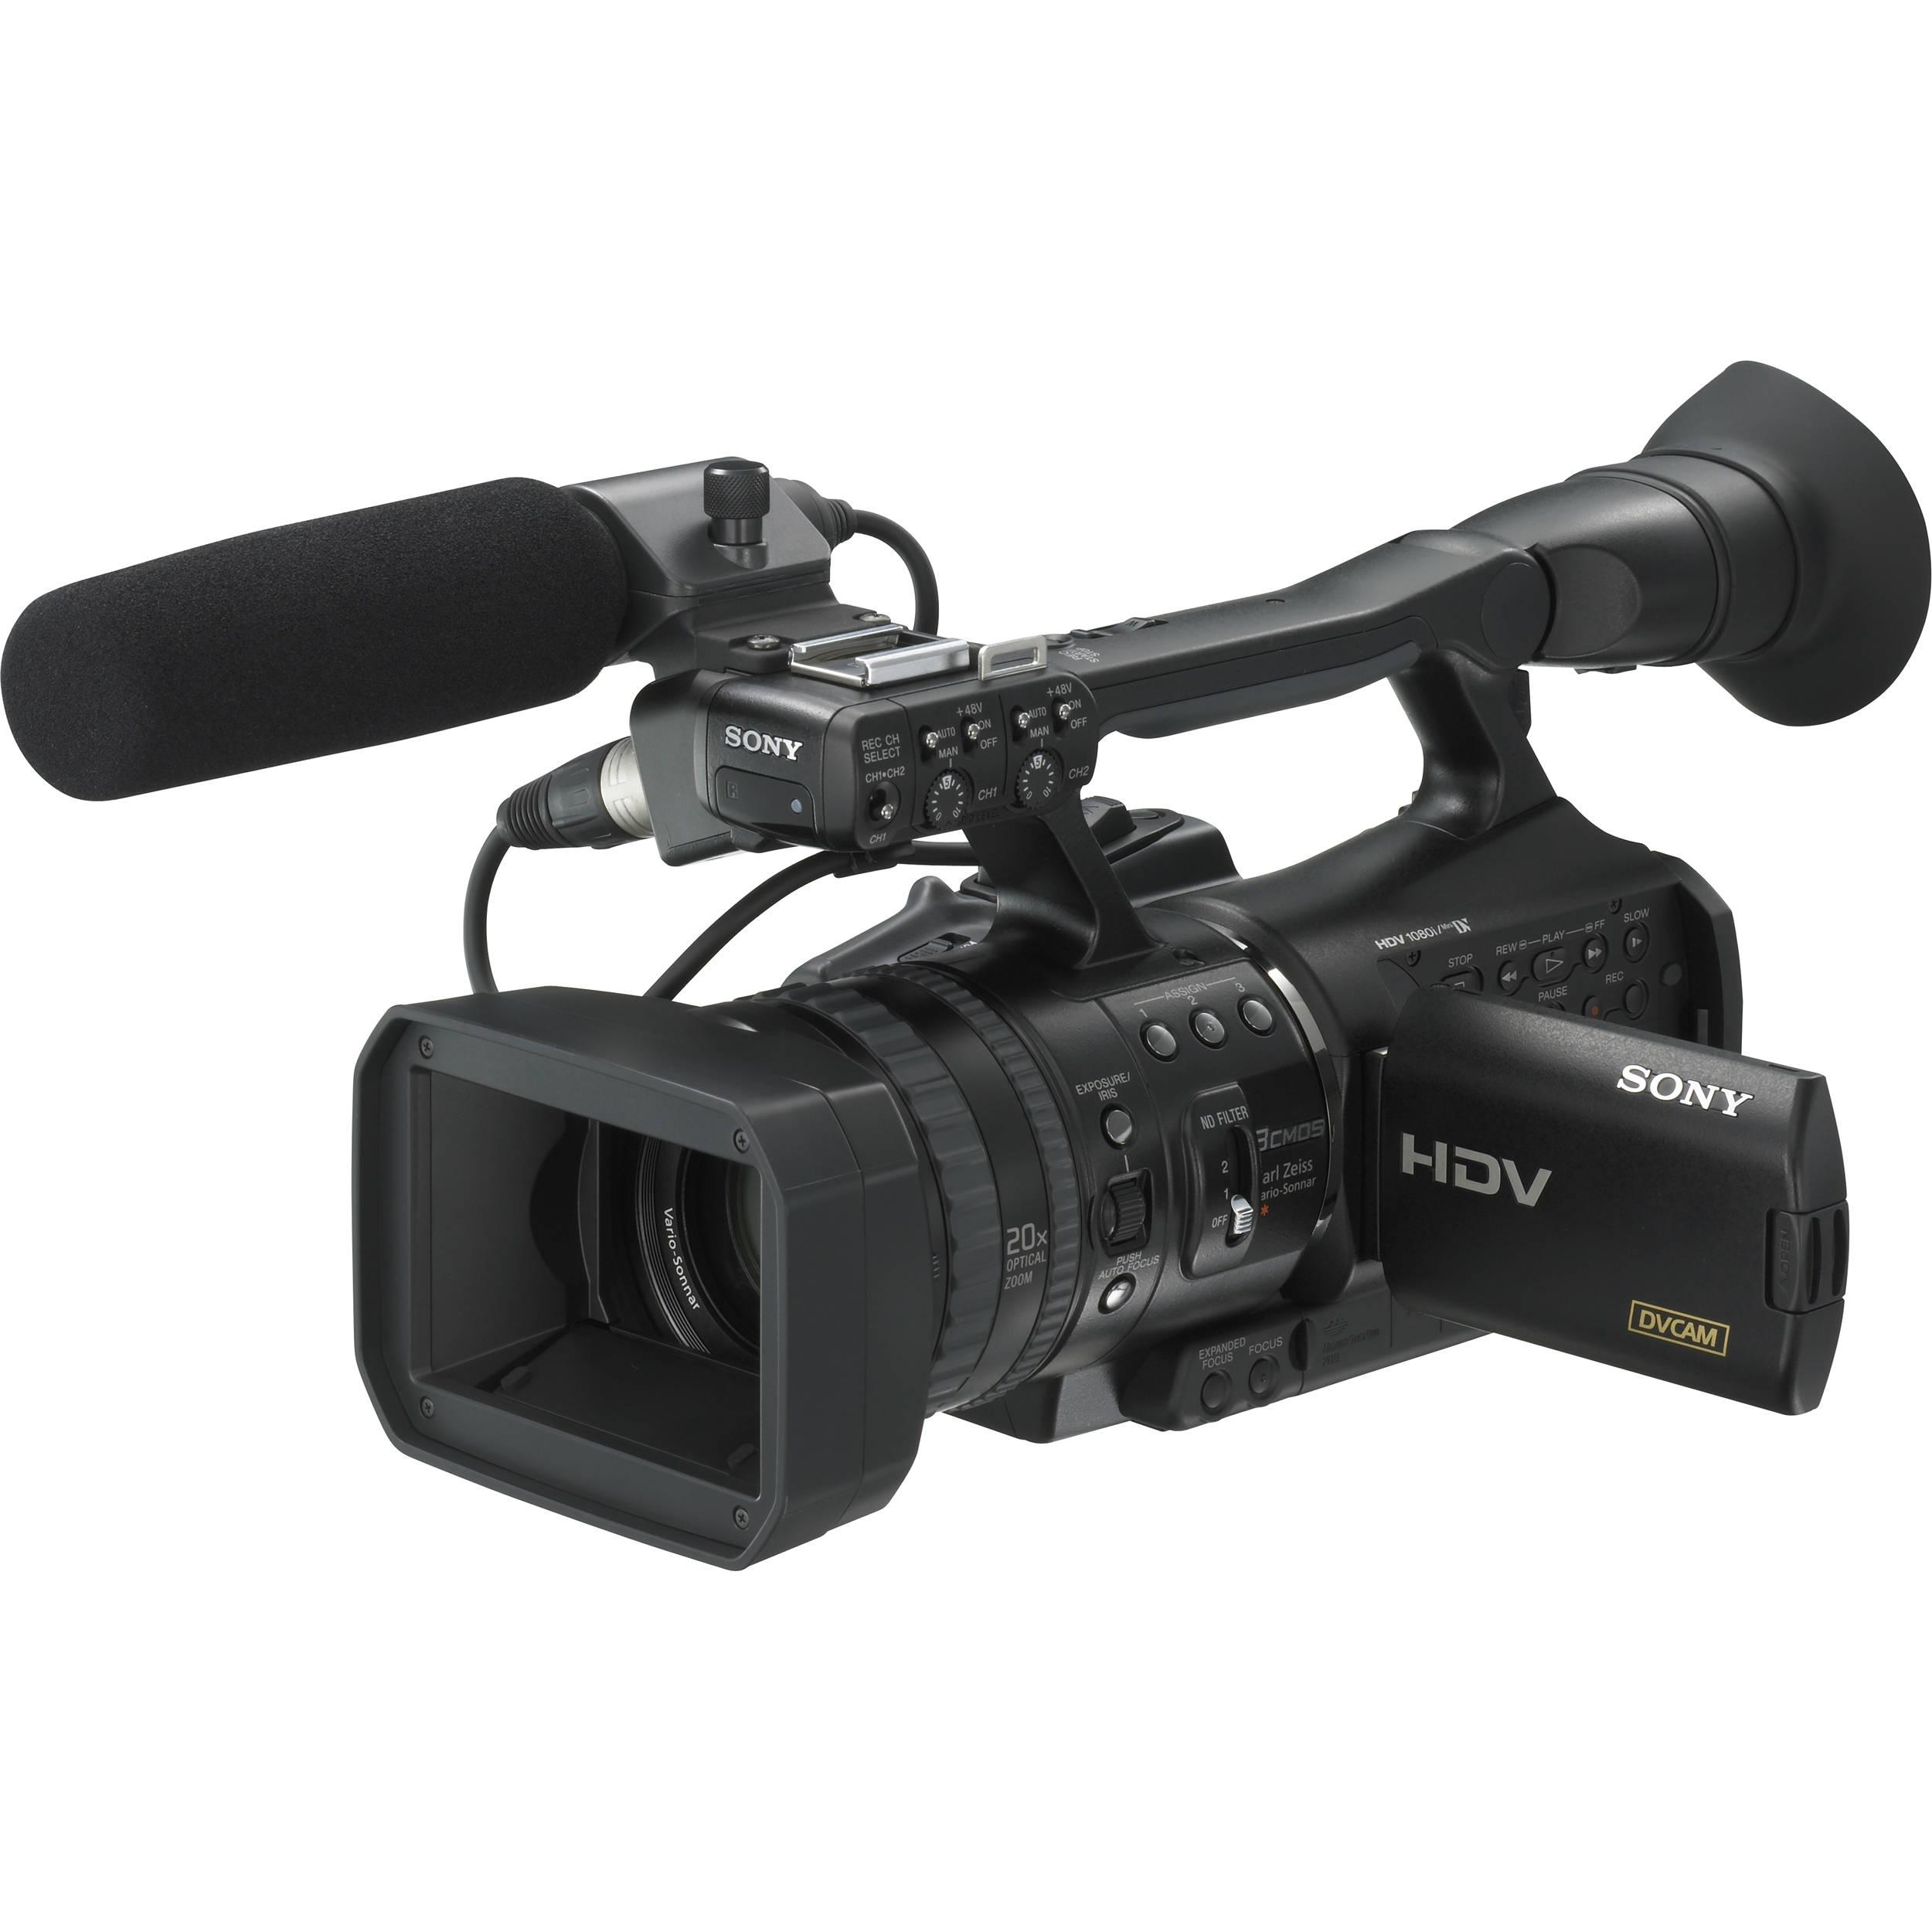 SONY HDV 1080I 64BIT DRIVER